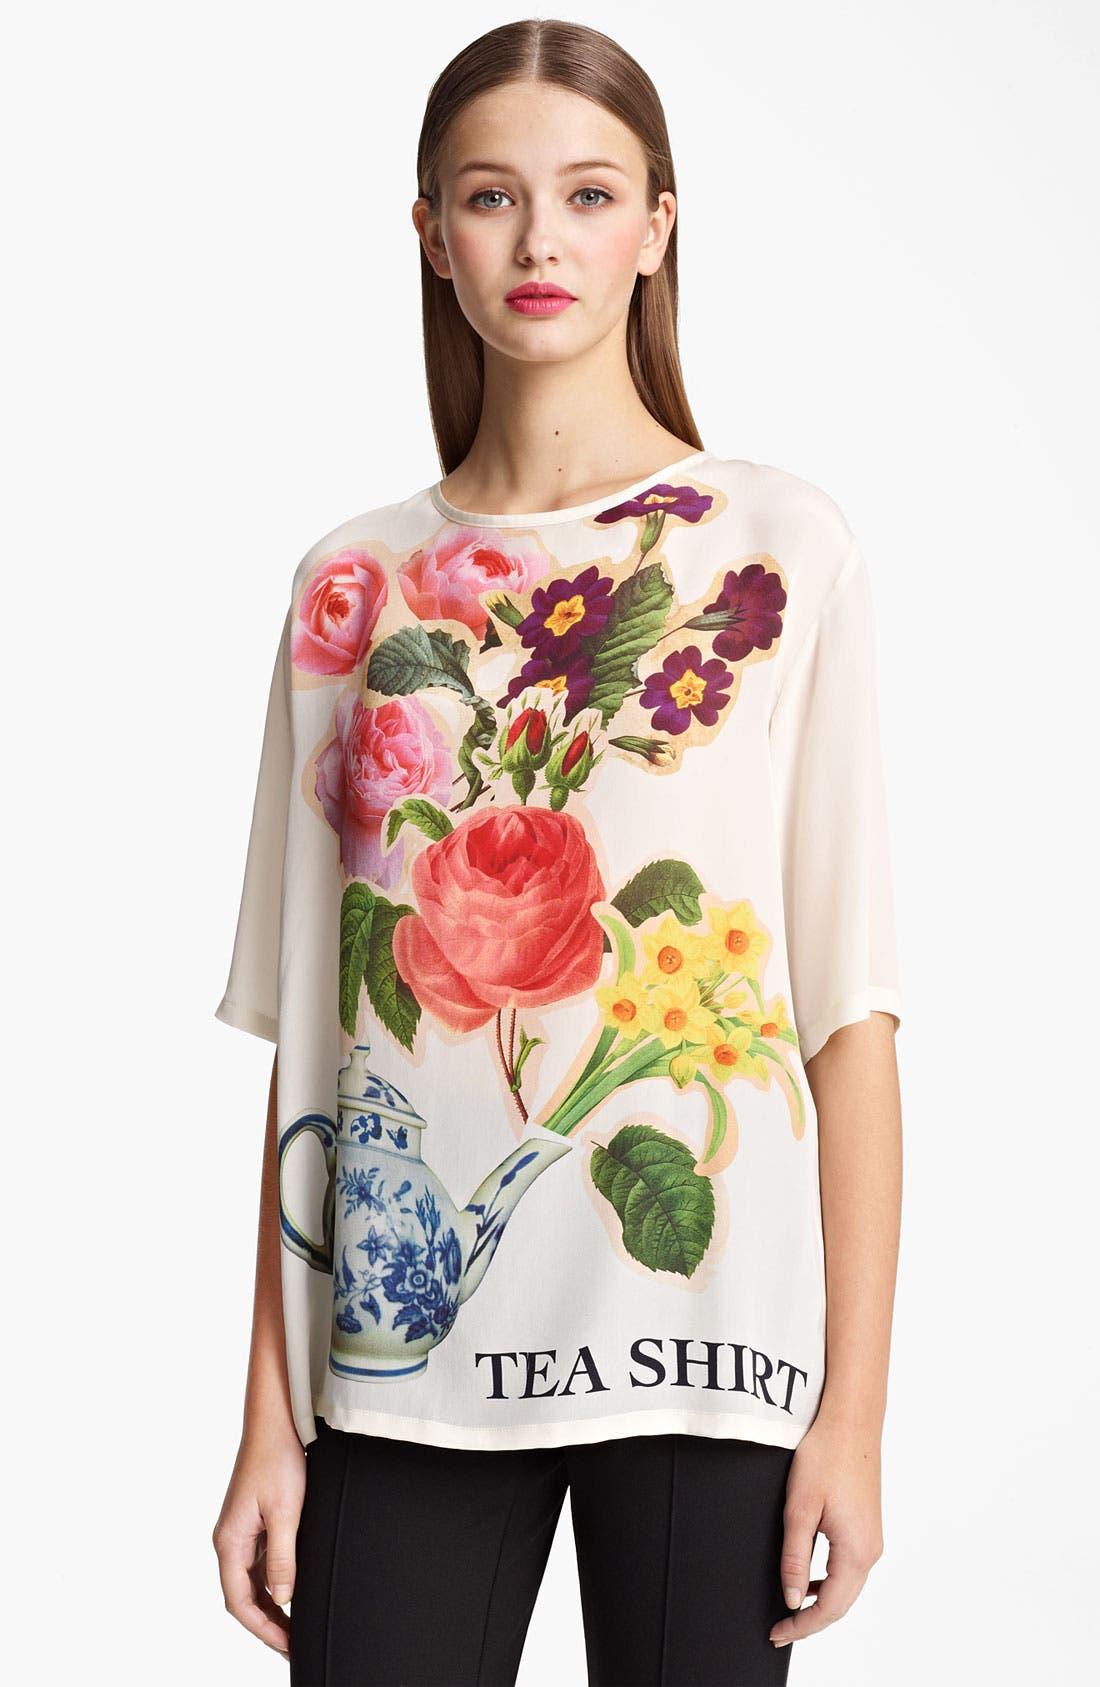 Main Image - Moschino Cheap & Chic 'Tea Shirt' Print Silk Tee